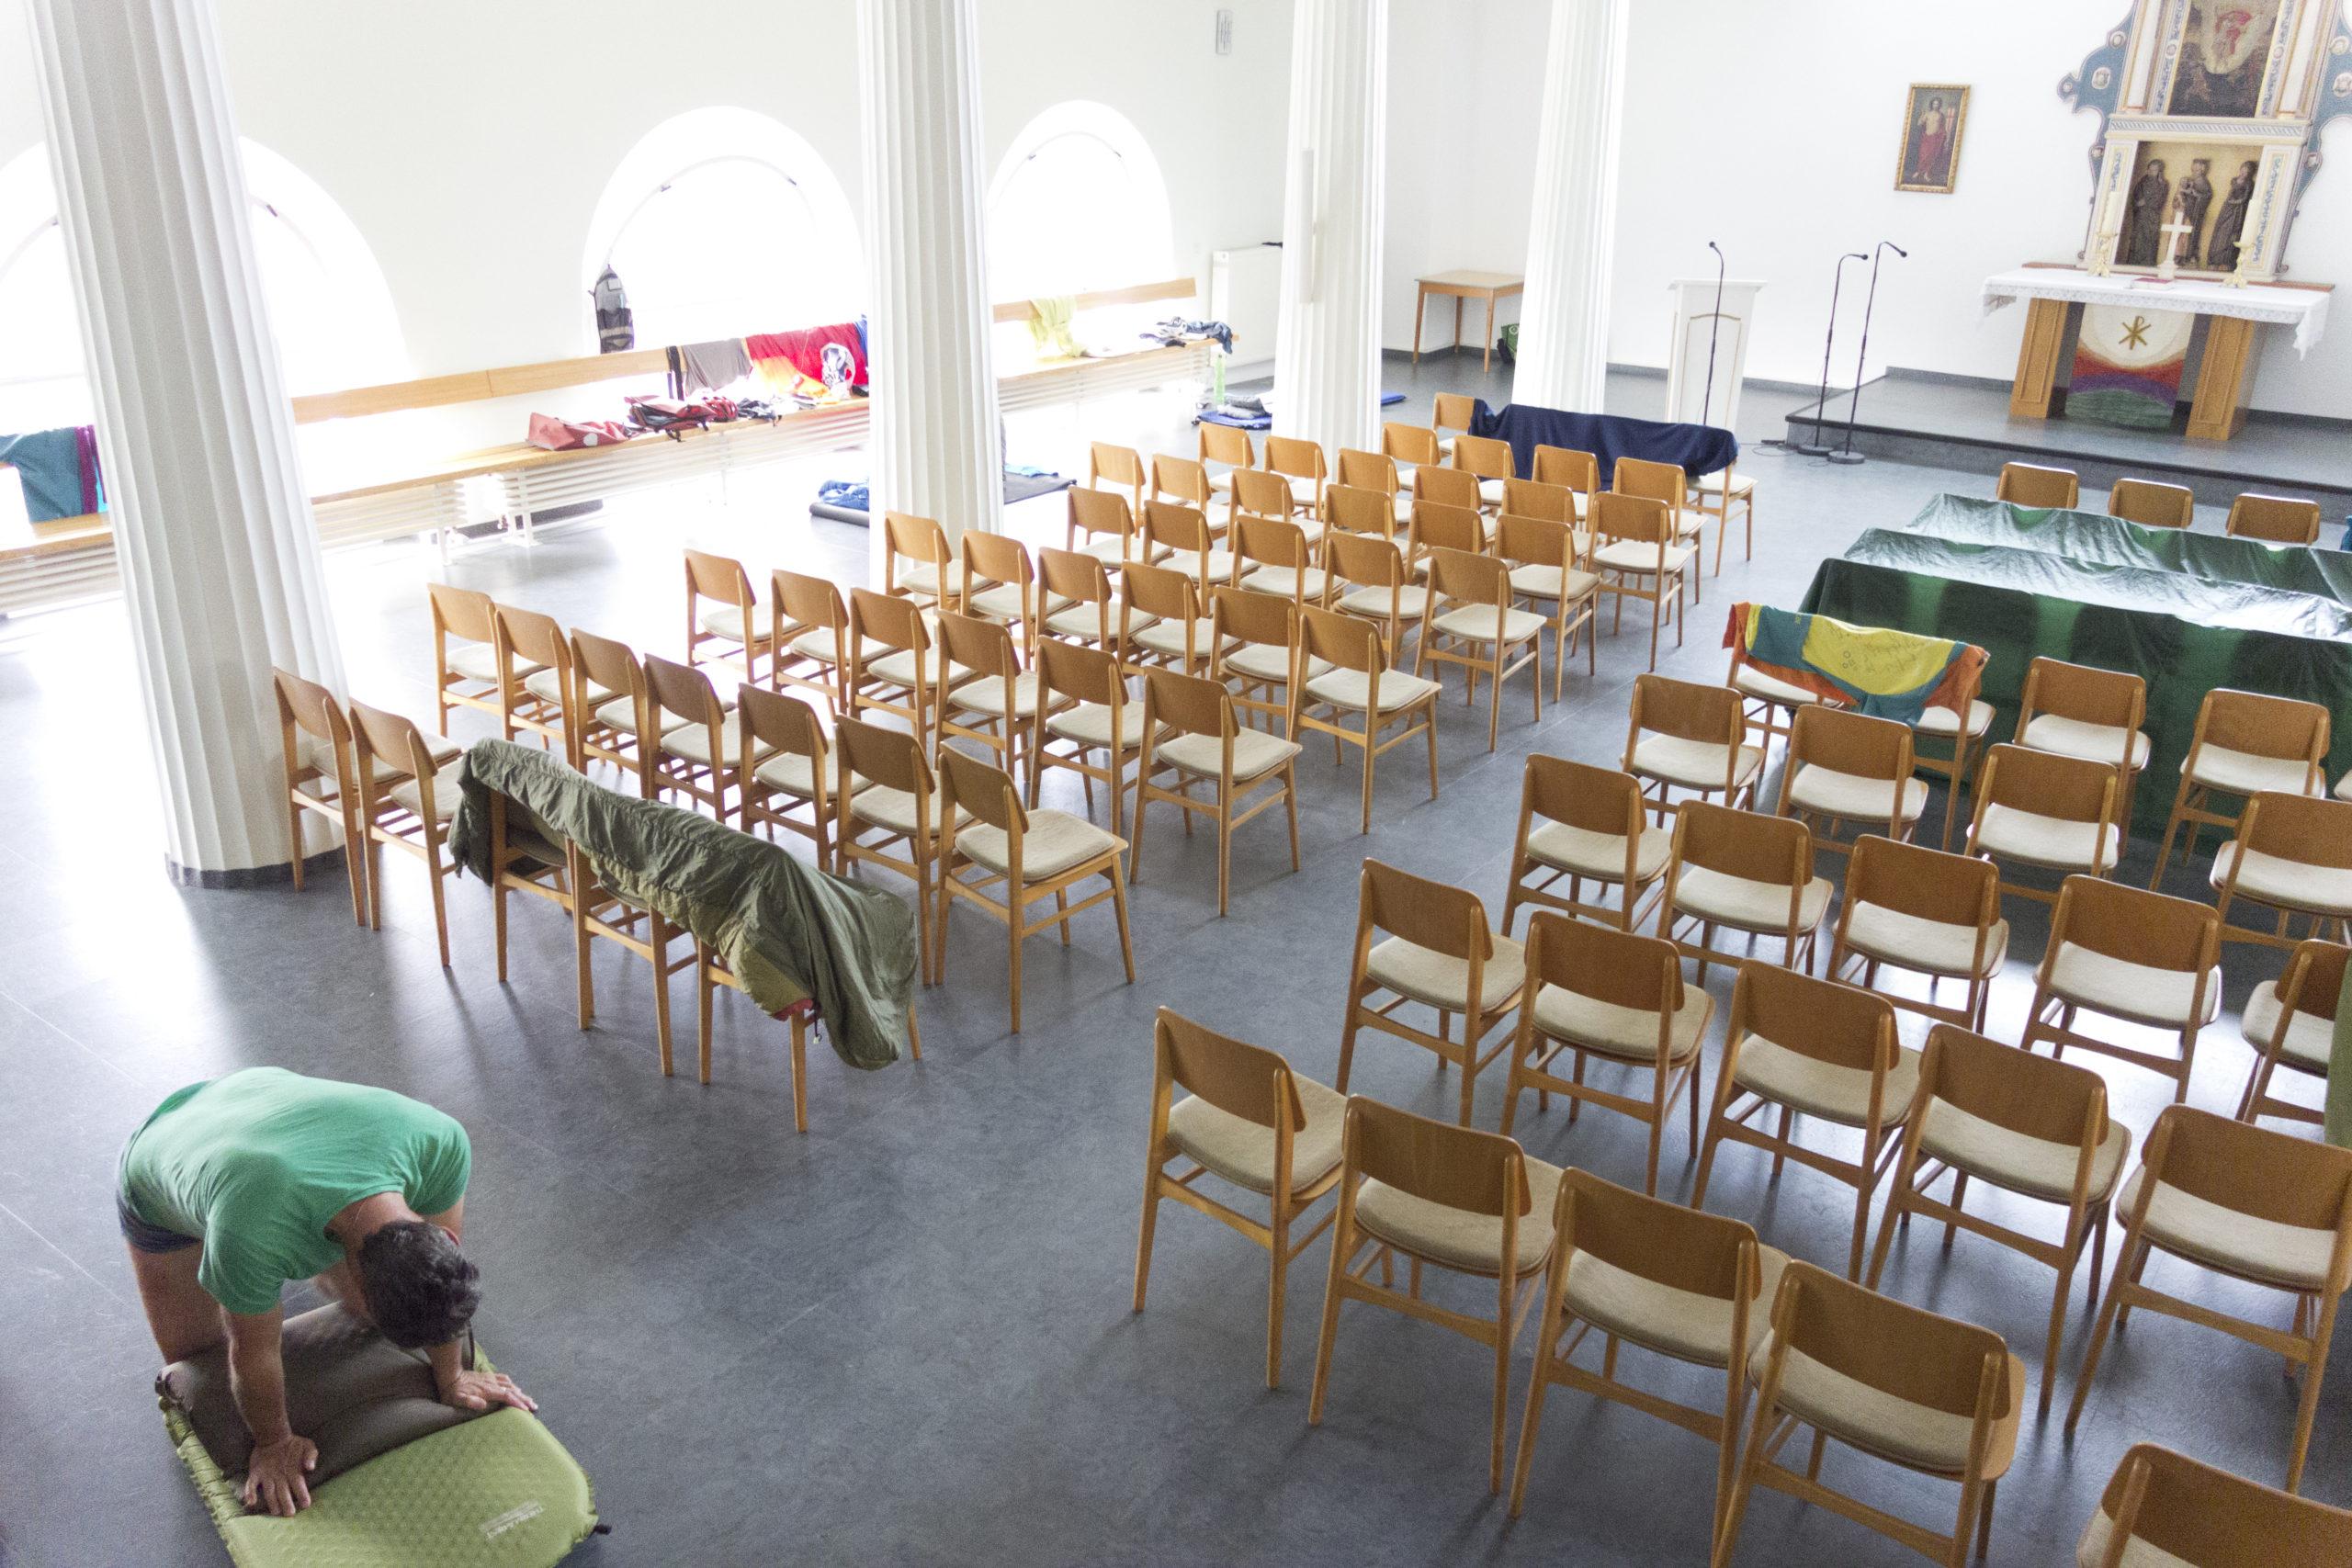 leere Stuhlreihen als Sinnbild für Corona